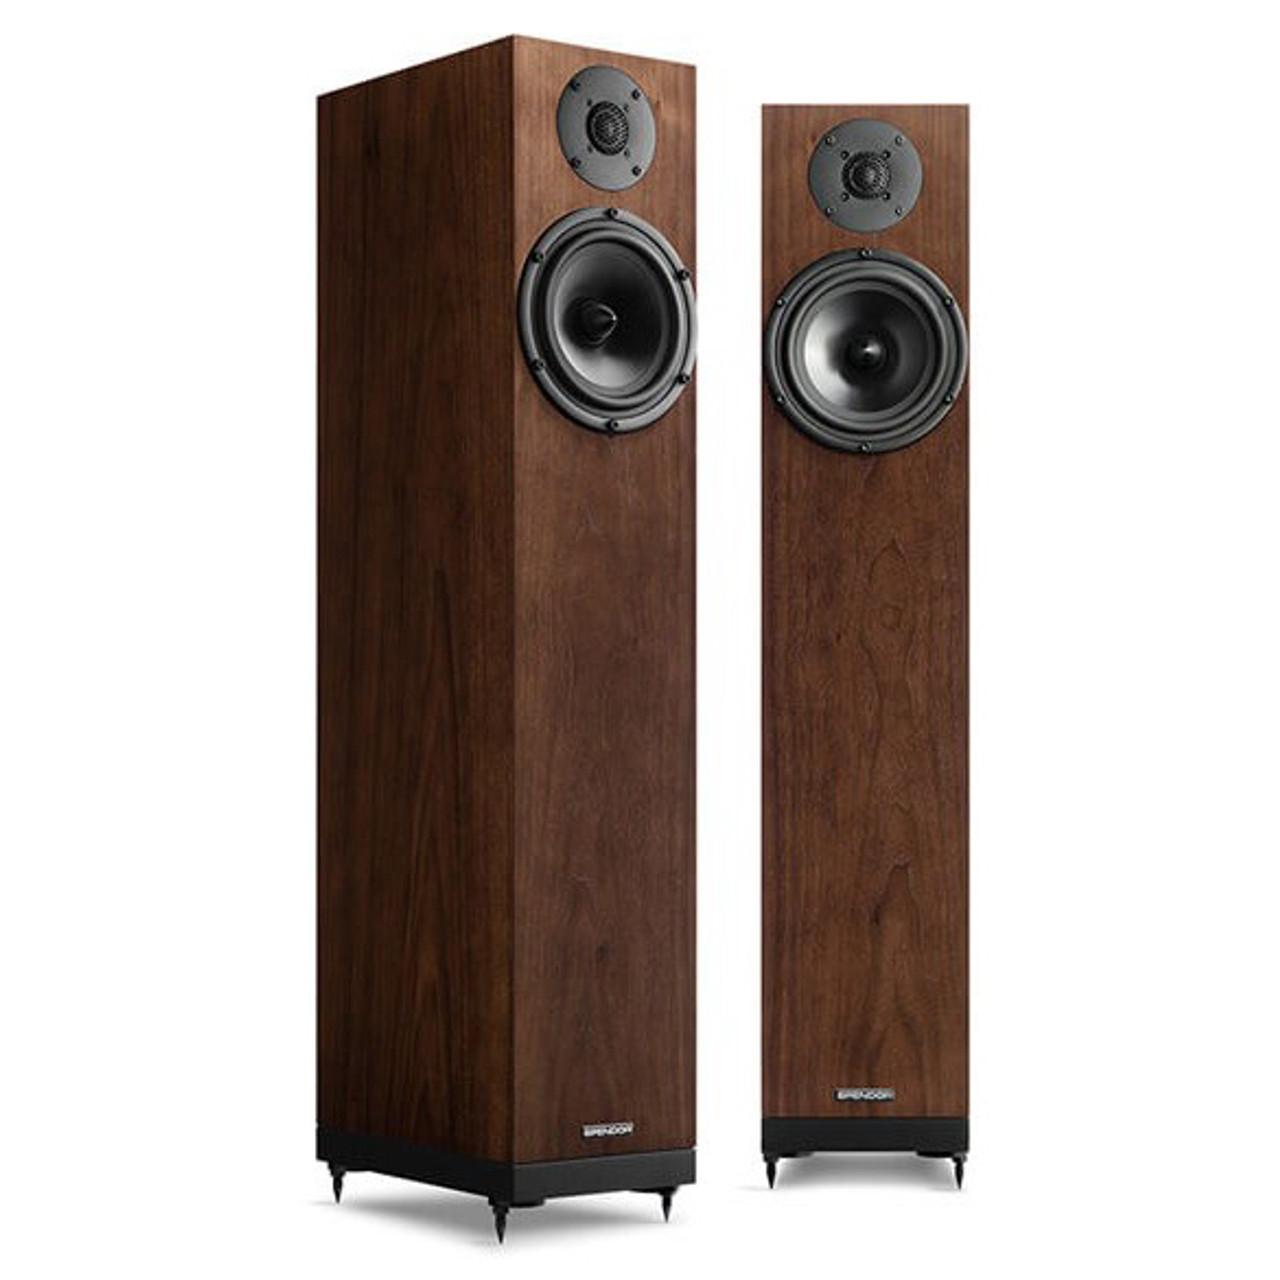 Spendor A7 speakers Walnut